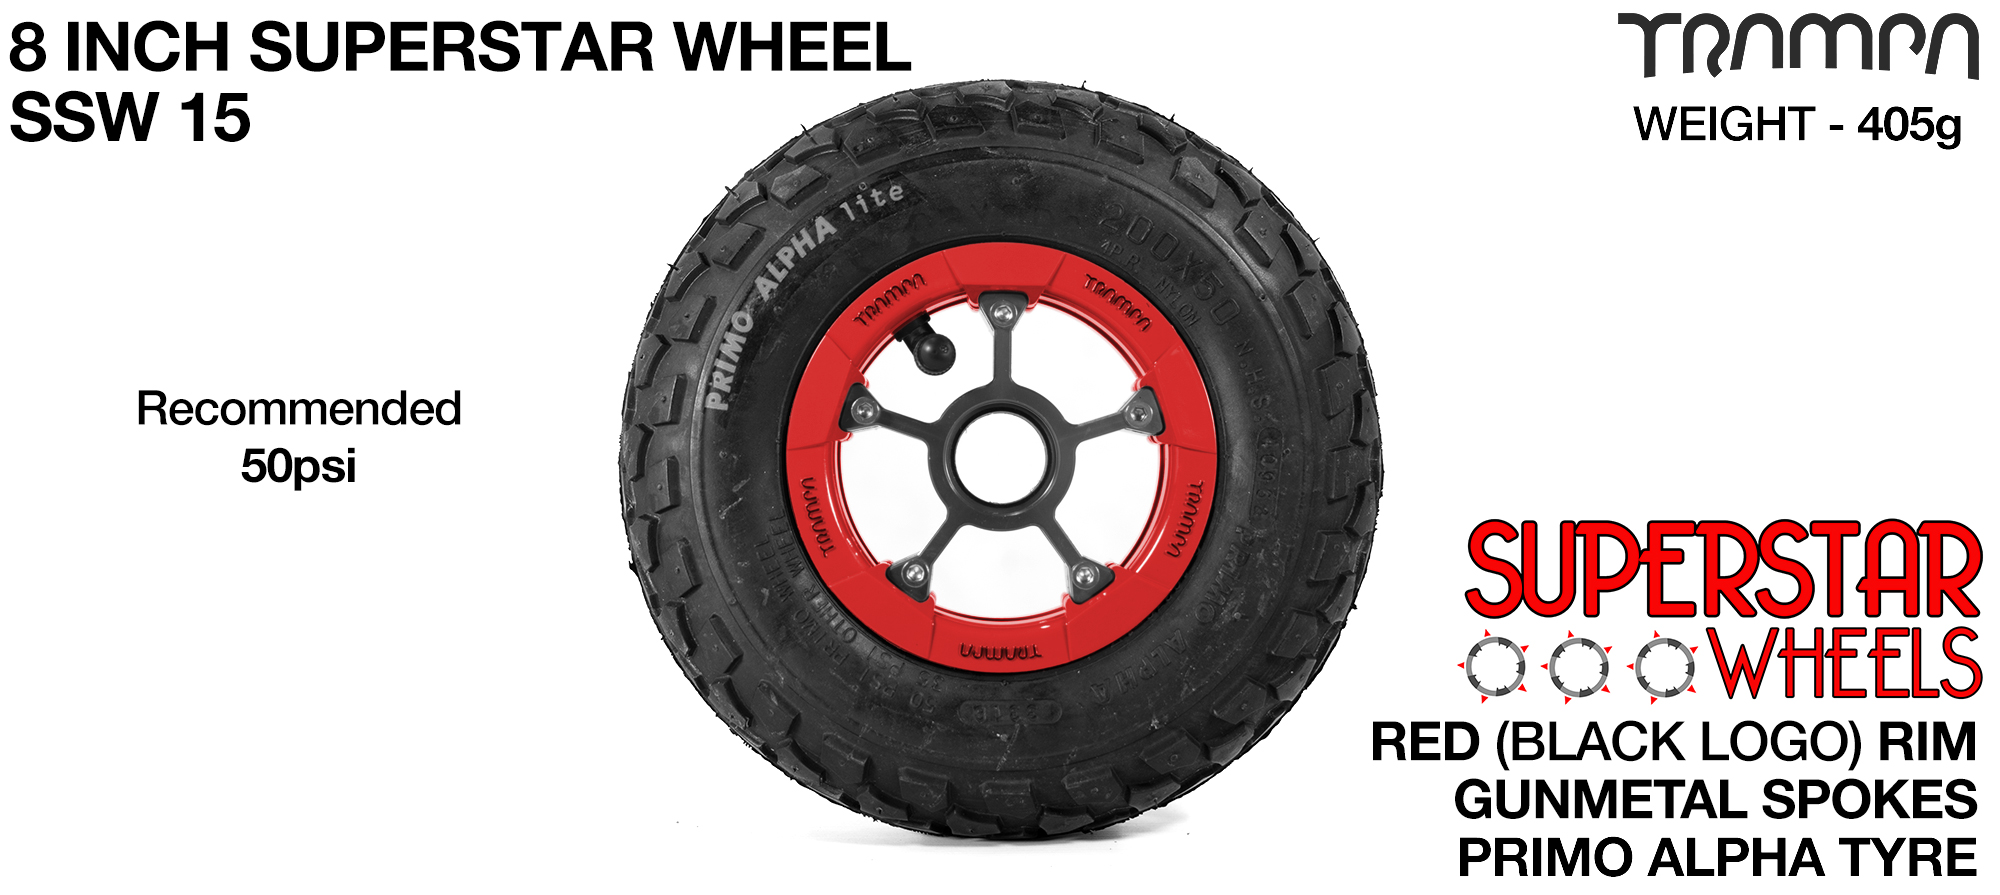 Superstar 8 inch wheel - Red Gloss Rim Gunmetal Anodised spokes & Black Alpha 8 Inch Tyres